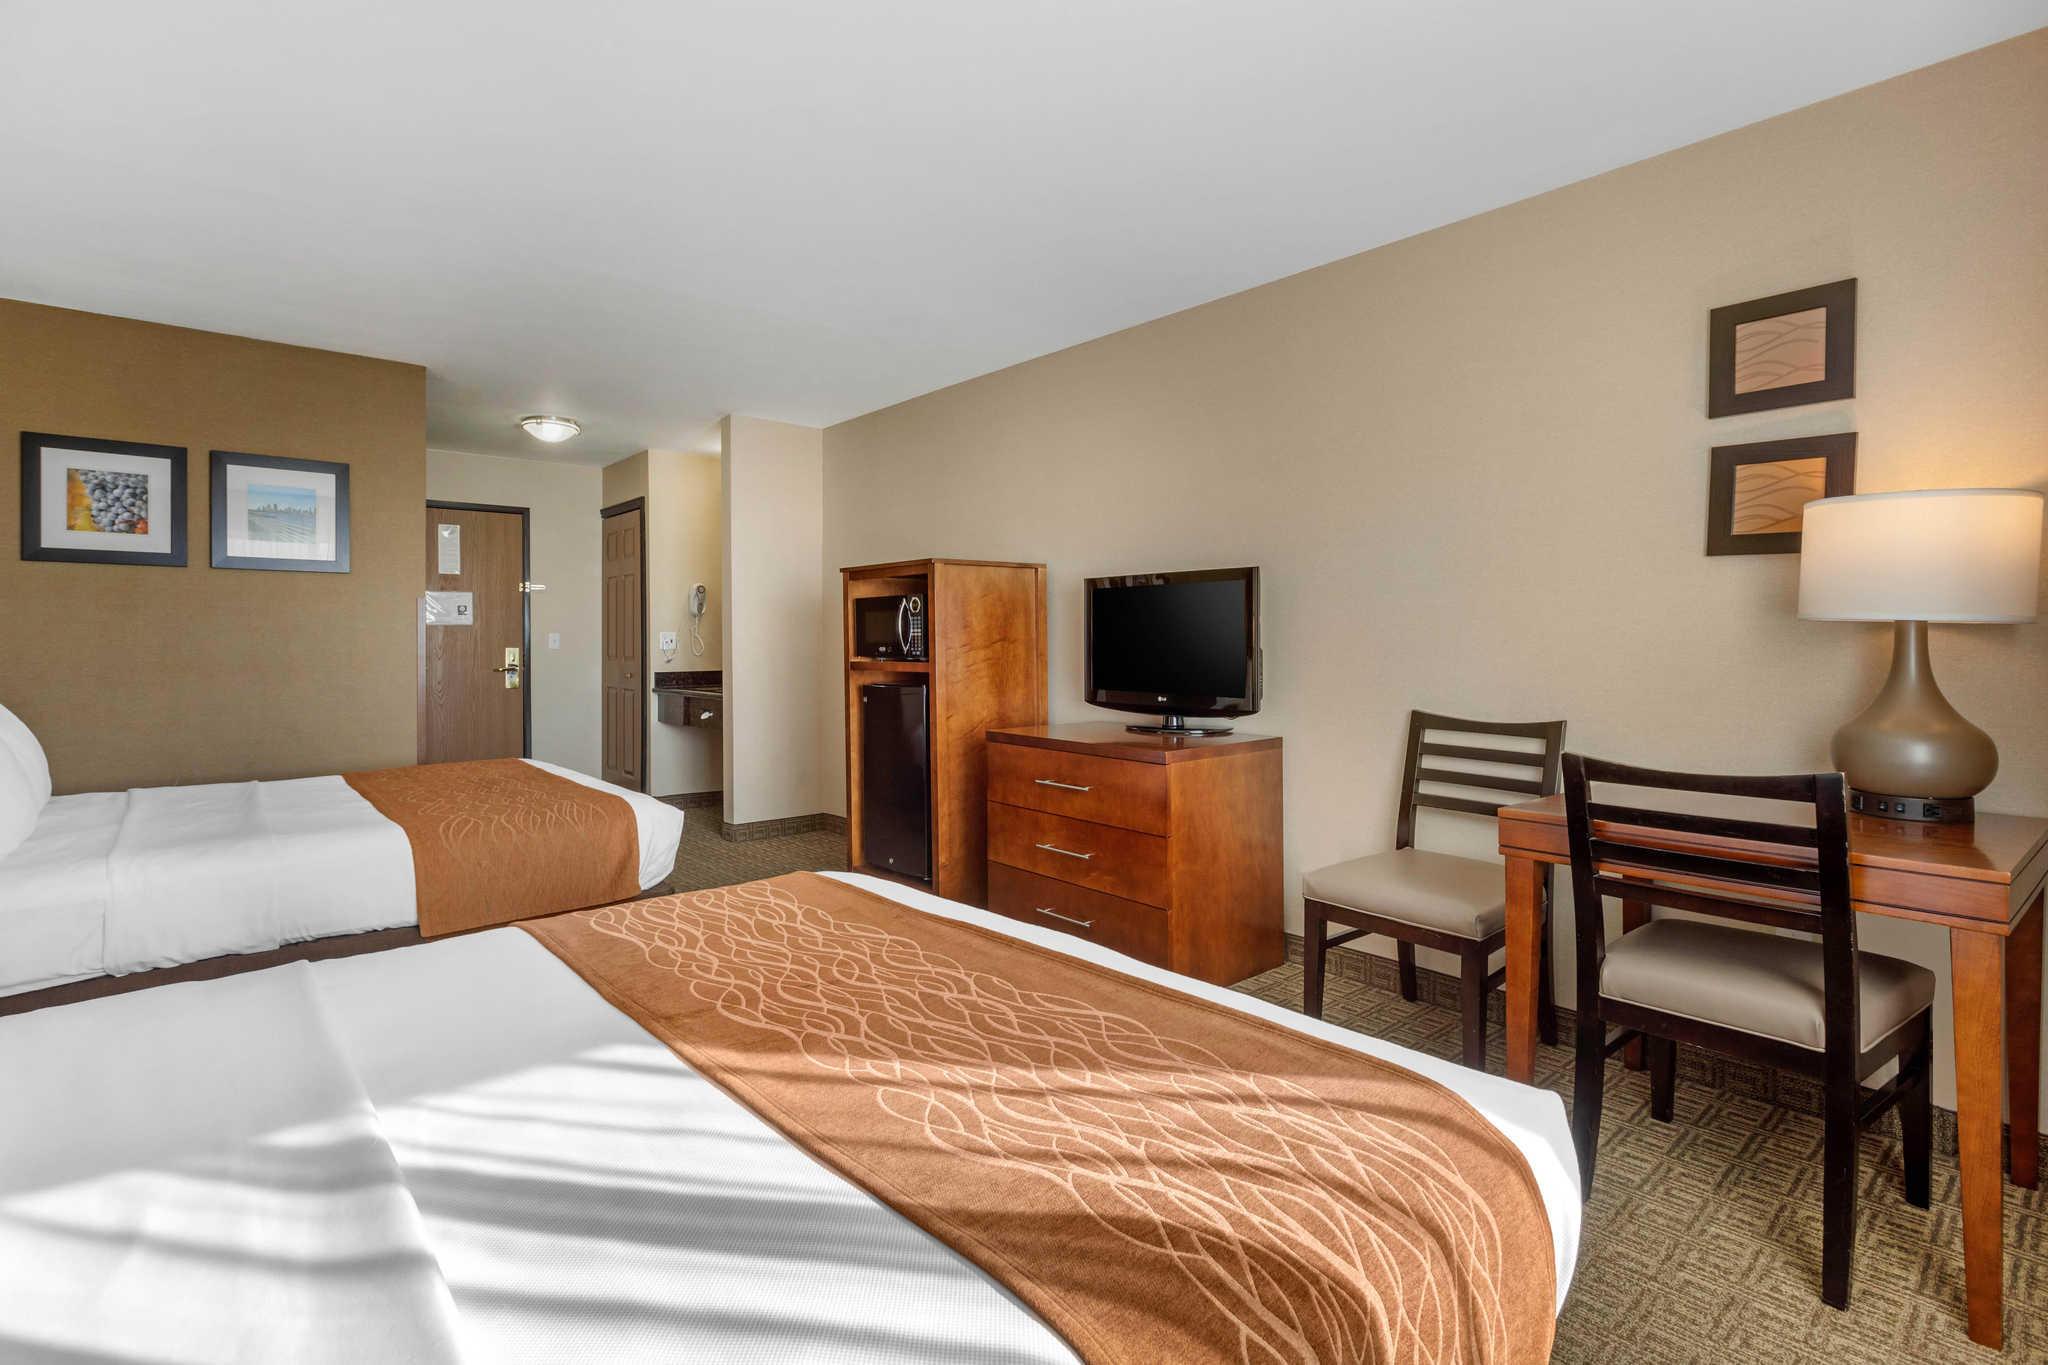 Comfort Inn & Suites Murrieta Temecula Wine Country image 16